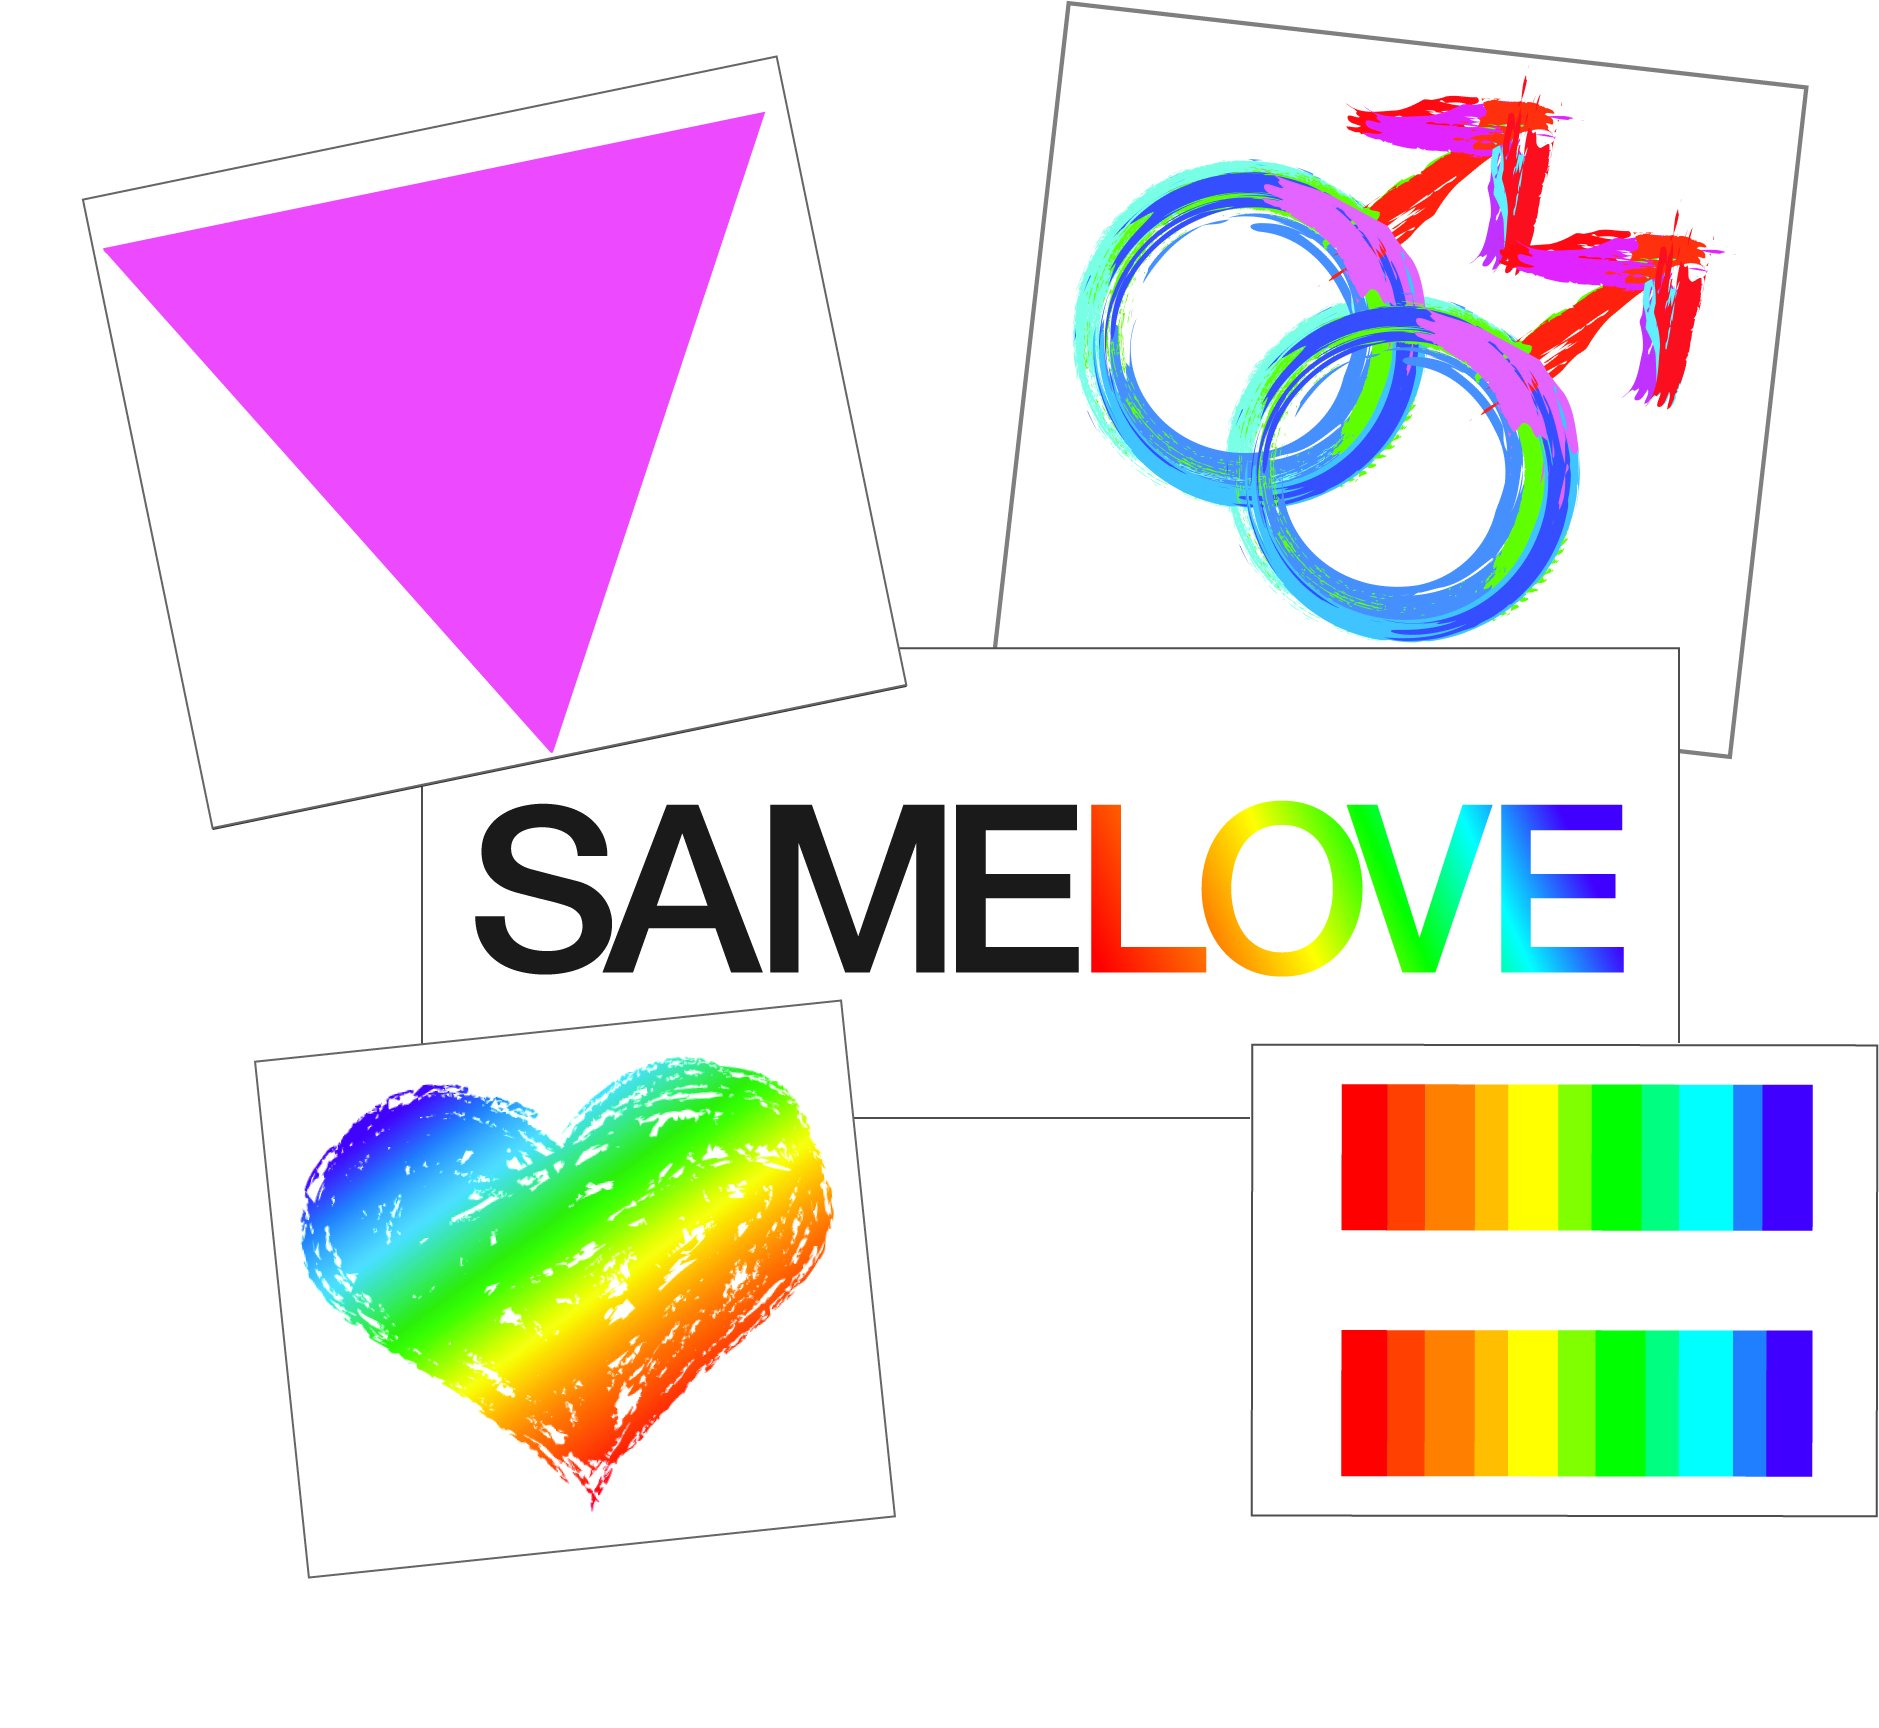 8daff6a4a73e0 Gay Pride Samelove Temporary Tattoo Set - Rainbow LGBT Body Art - Friend  Gift - Accessory - Set of 2 Temporary Tattoos, Size 2.5